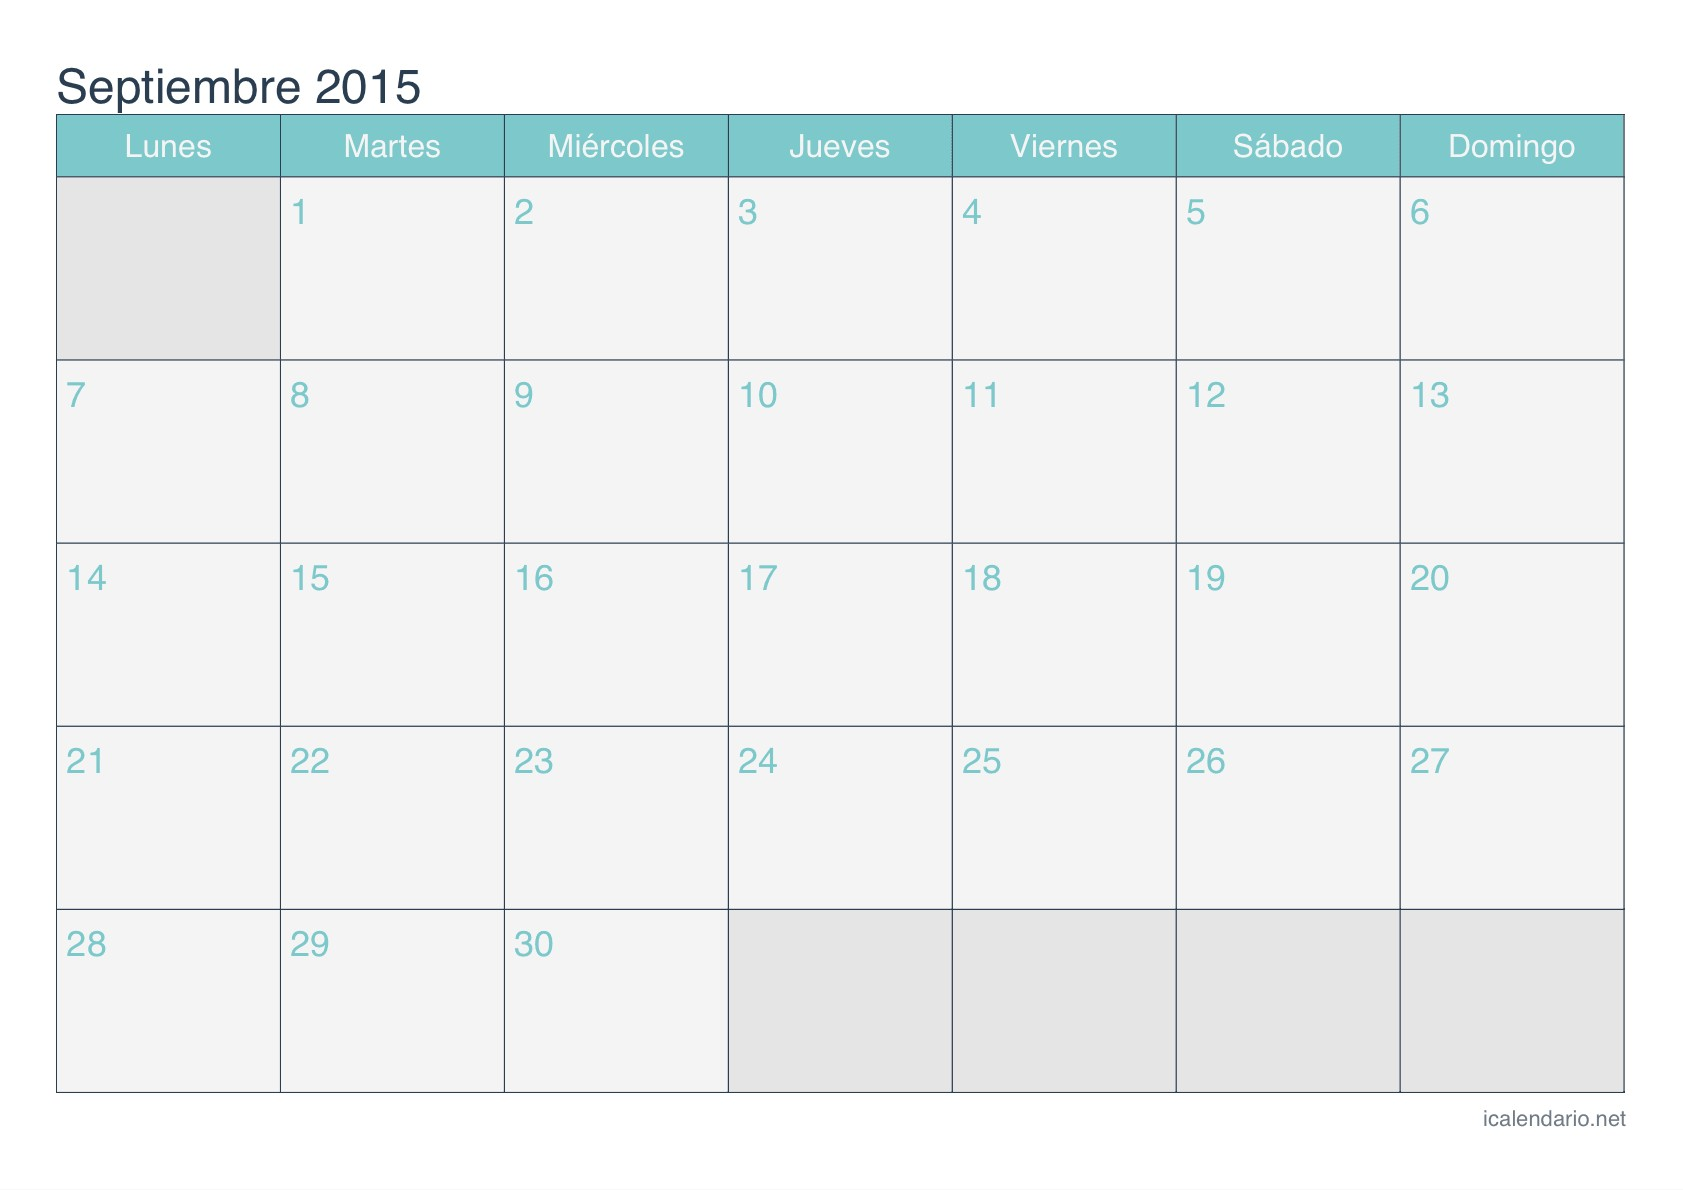 Calendario 2019 Chile Para Imprimir Más Recientes Calendario Octubre 2015 Para Imprimir 2017 Vector Calendar In Of Calendario 2019 Chile Para Imprimir Actual 2019 2018 Calendar Printable with Holidays List Kalender Kalendar